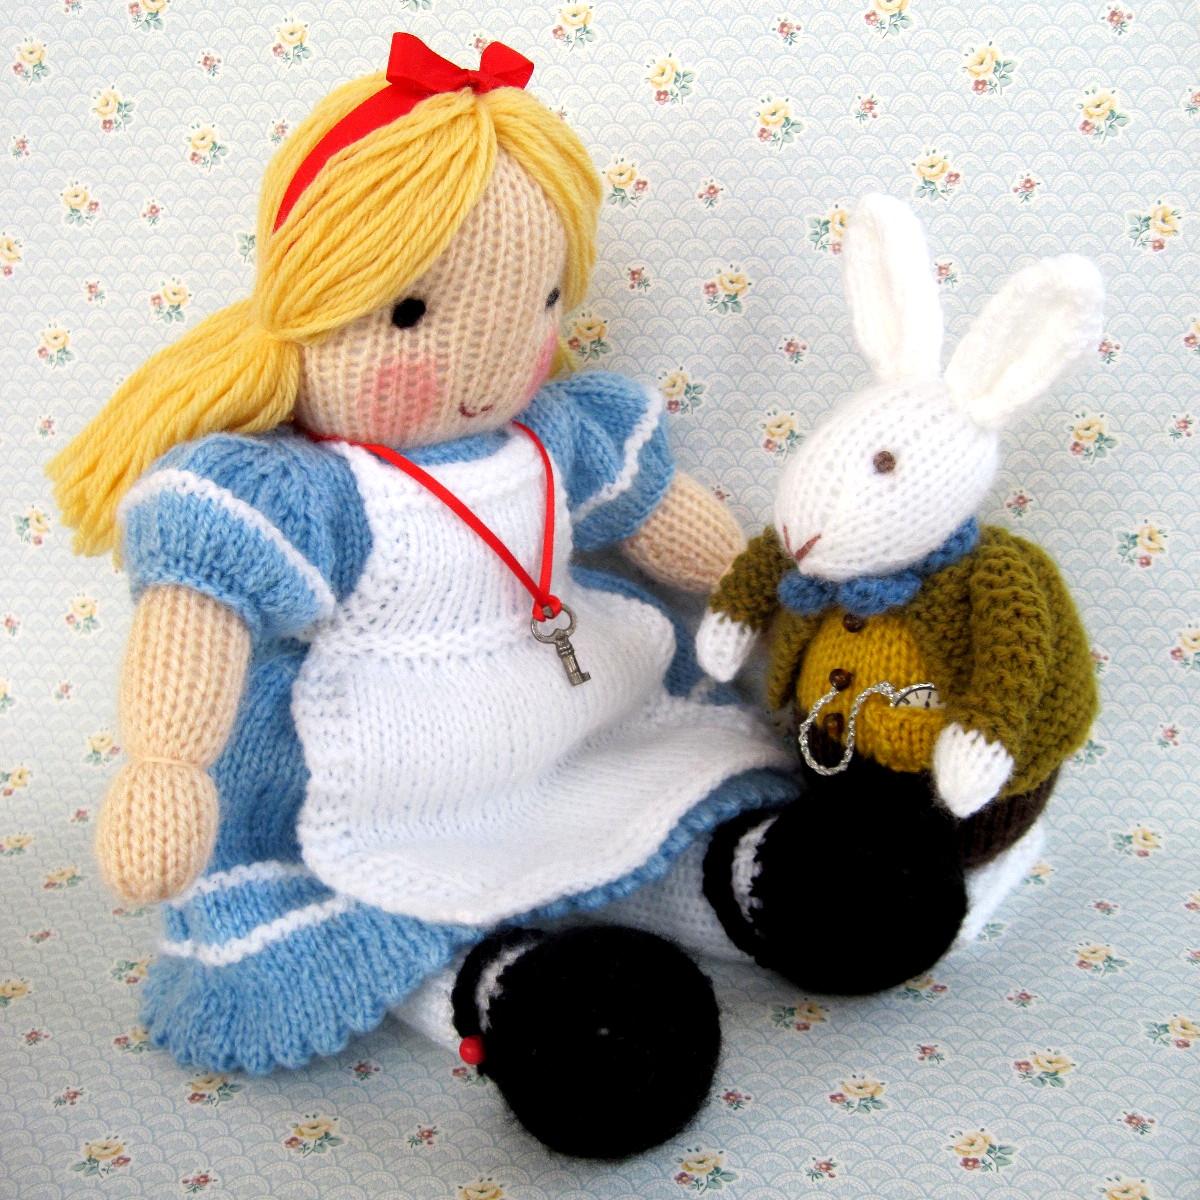 Flutterby Patch: Alice in Wonderland